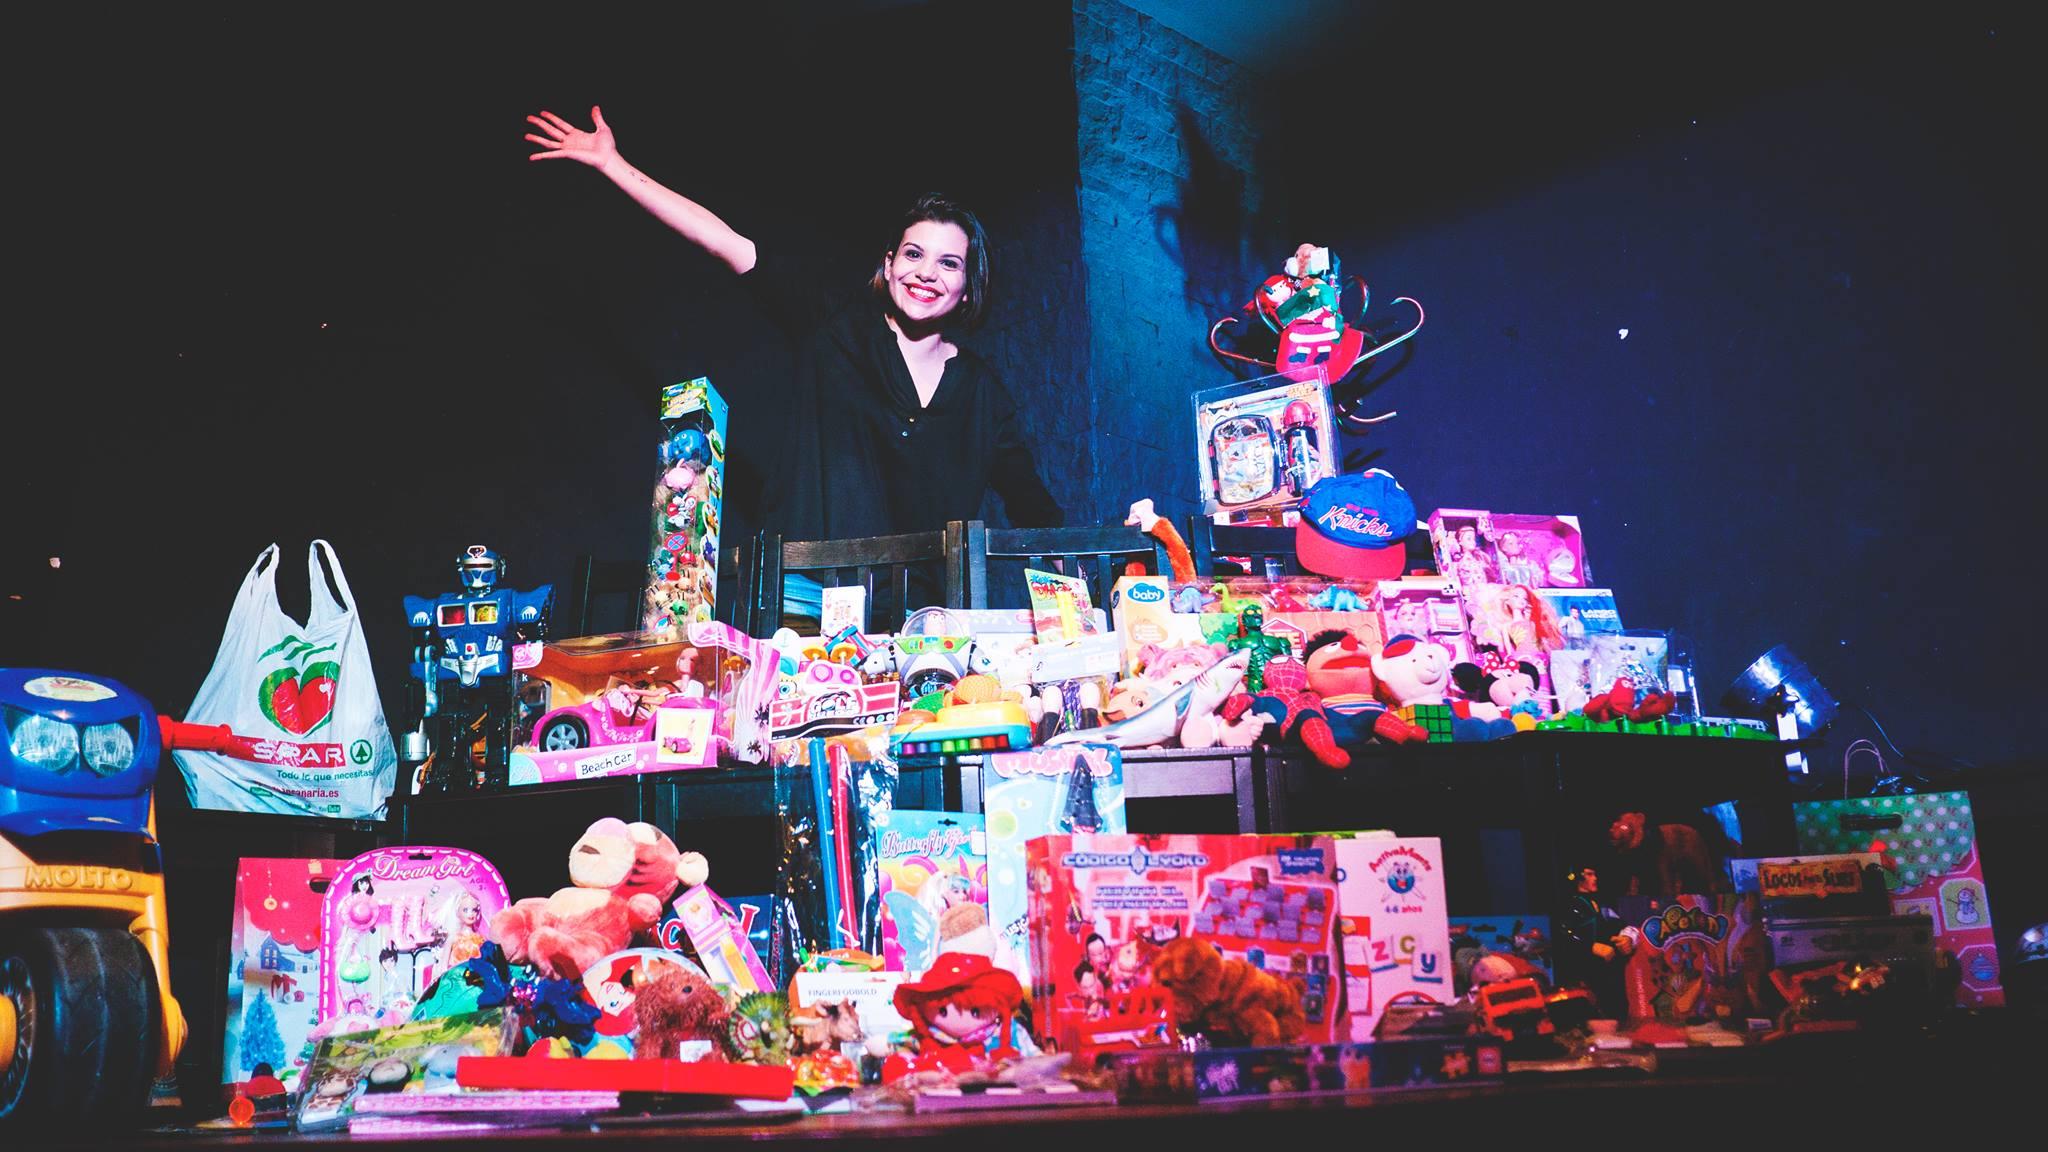 Recogida de juguetes de Magia y Arte